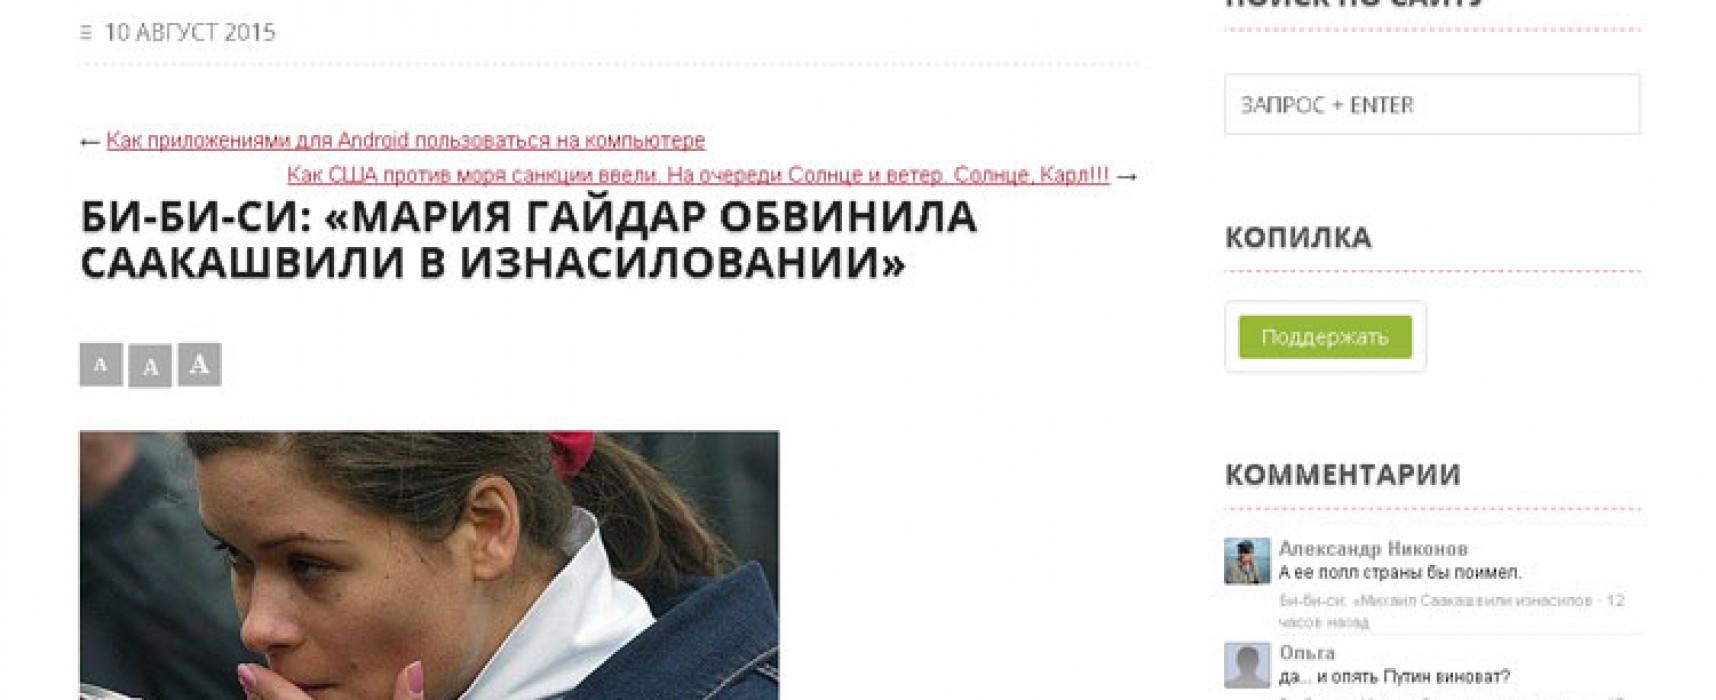 Fals: Maria Gaidar l-a acuzat pe Mihail Saakaşvili de viol